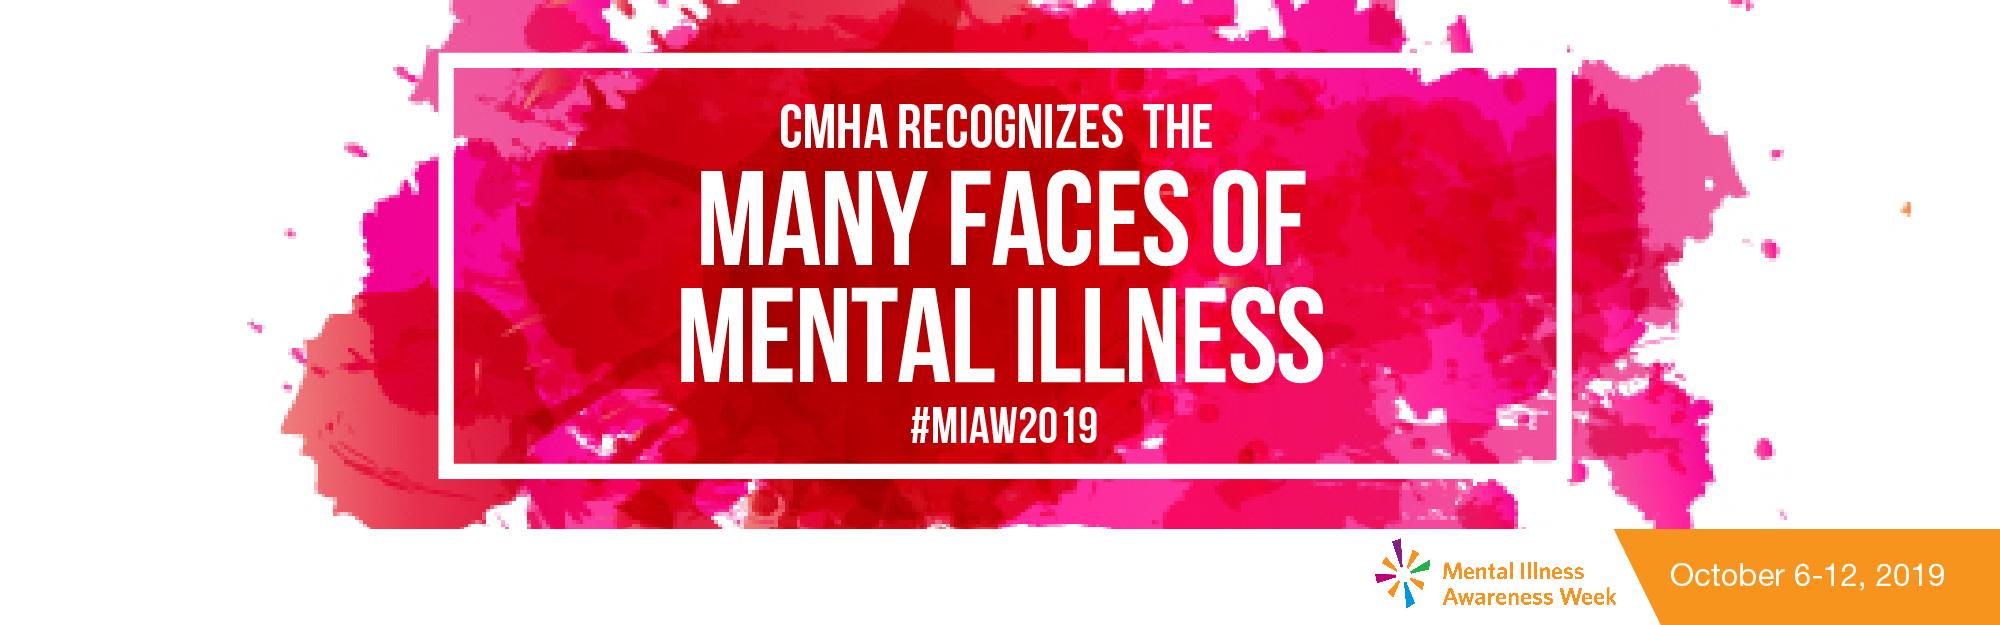 CMHA-S/M recognizes Mental Illness Awareness Week